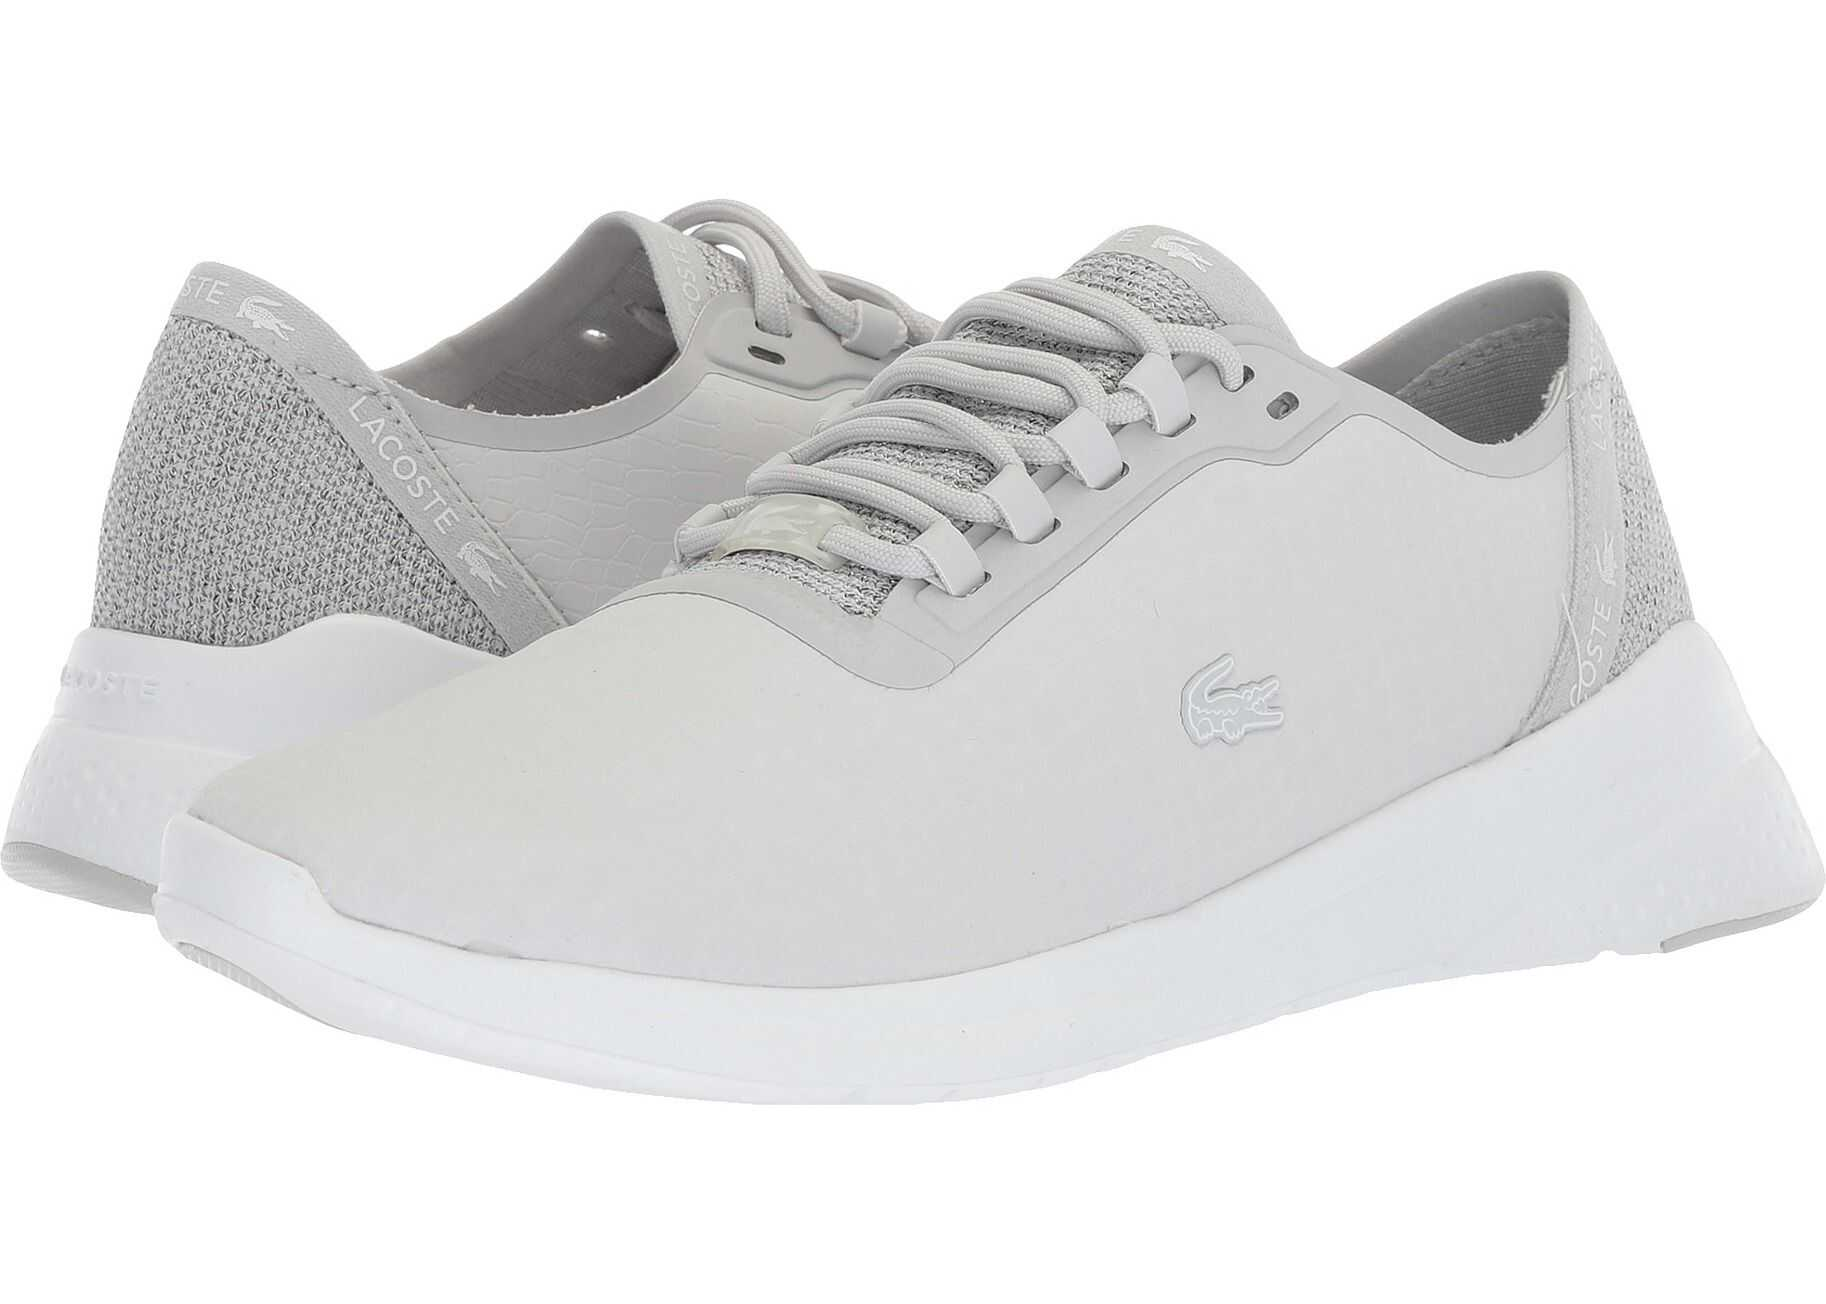 Lacoste LT Fit 318 3 Light Grey/White